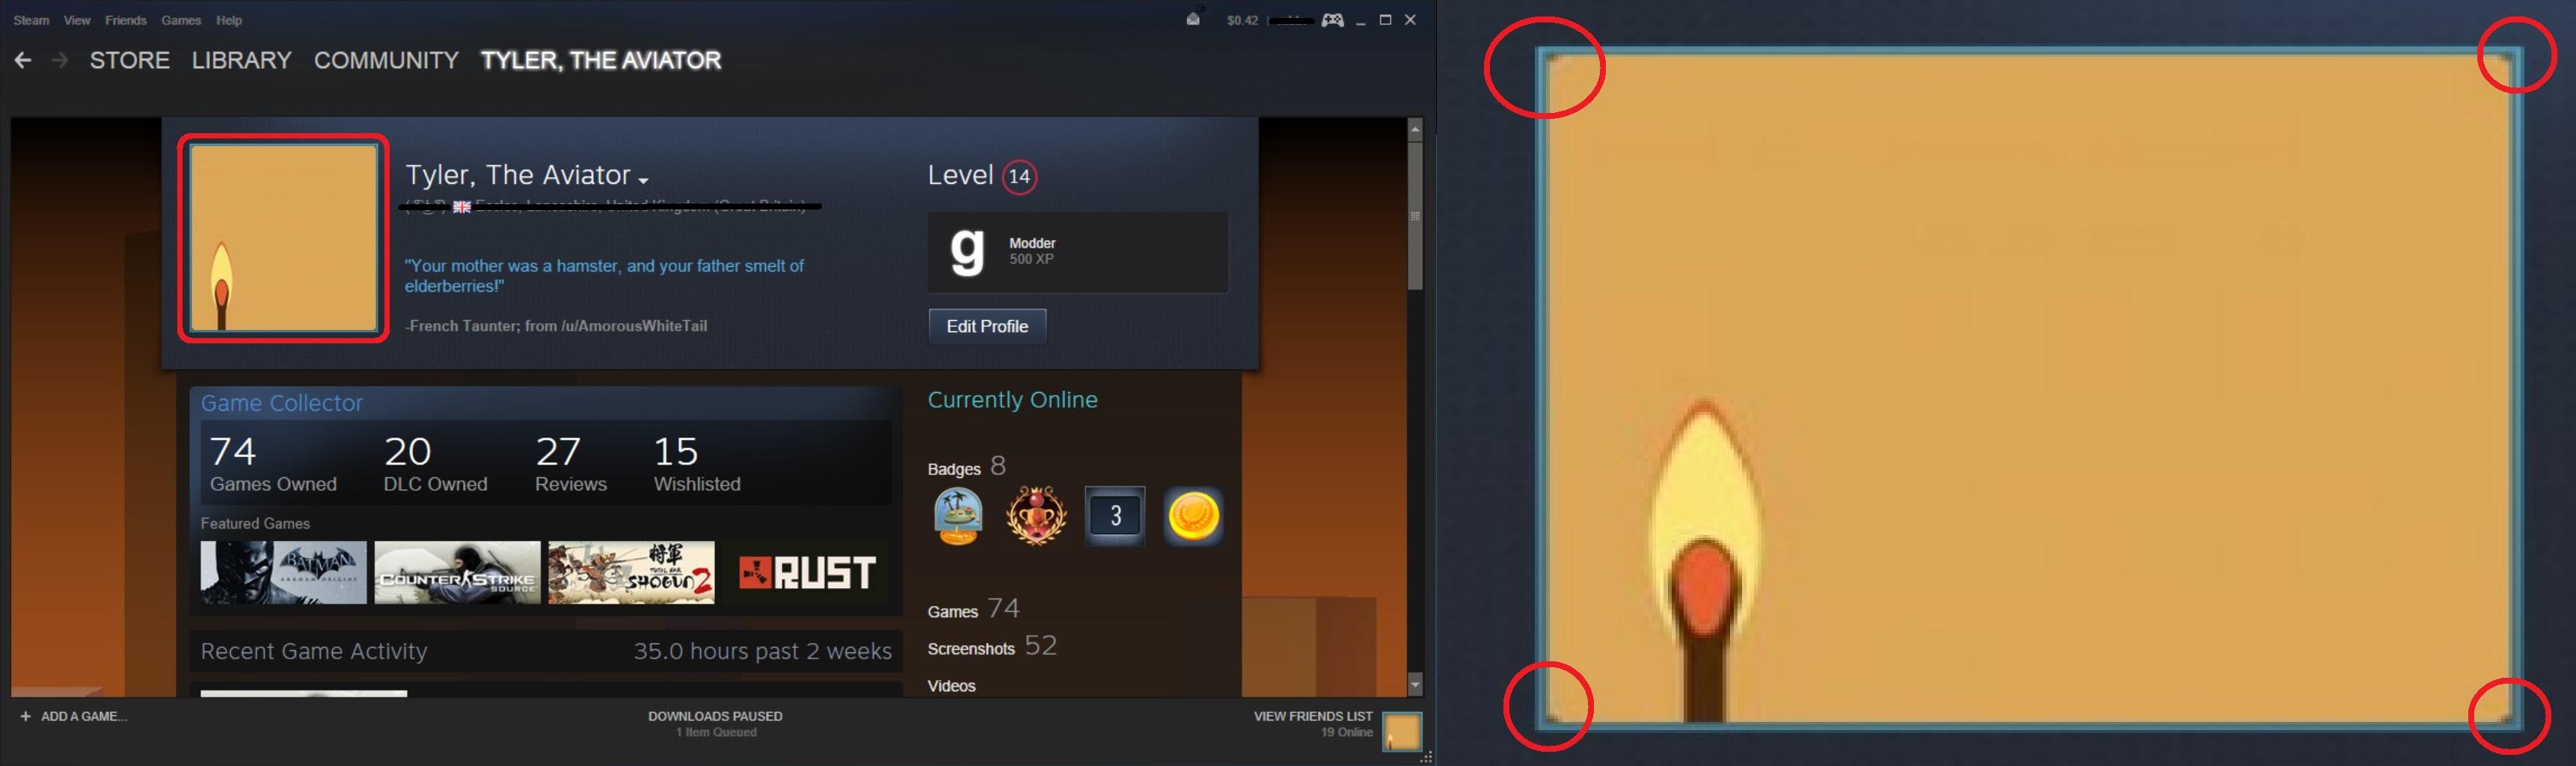 Steam Profile Picture Size Hobitfullringco